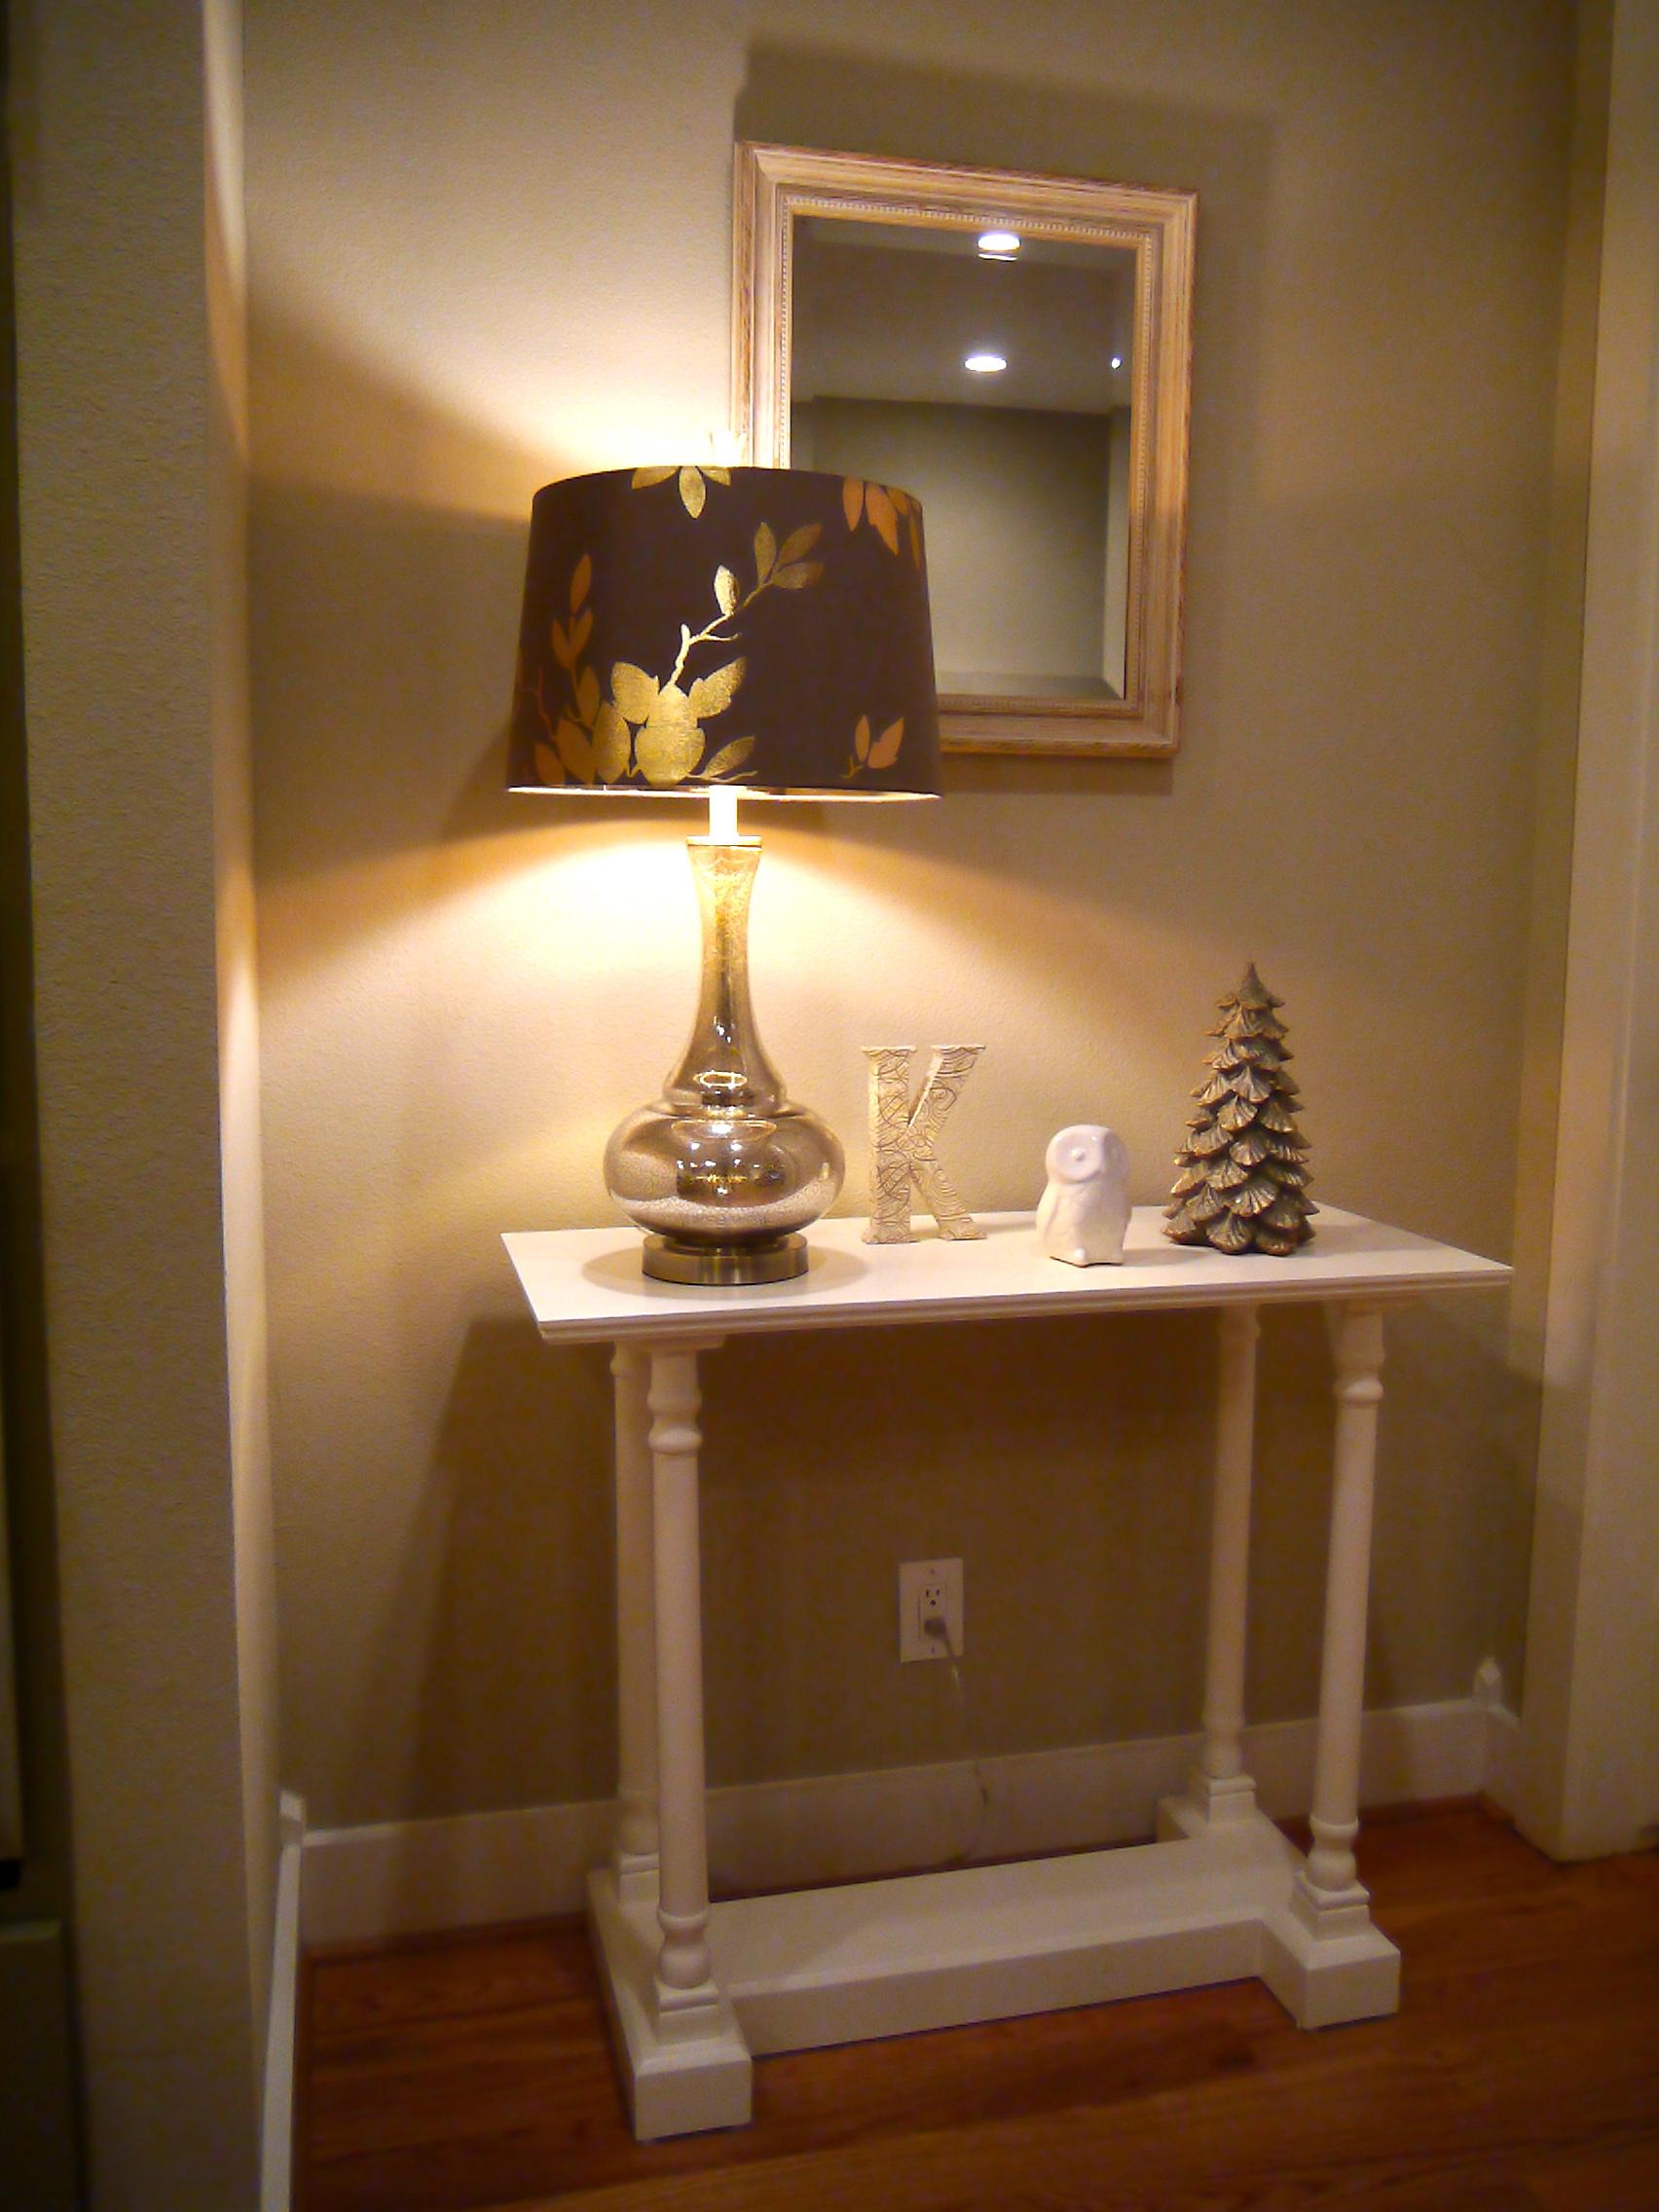 Lamp  /  Monogram Letter  /  Owl  /  Tree Candle  (similar) /  Table  (similar) / Mirror (custom)